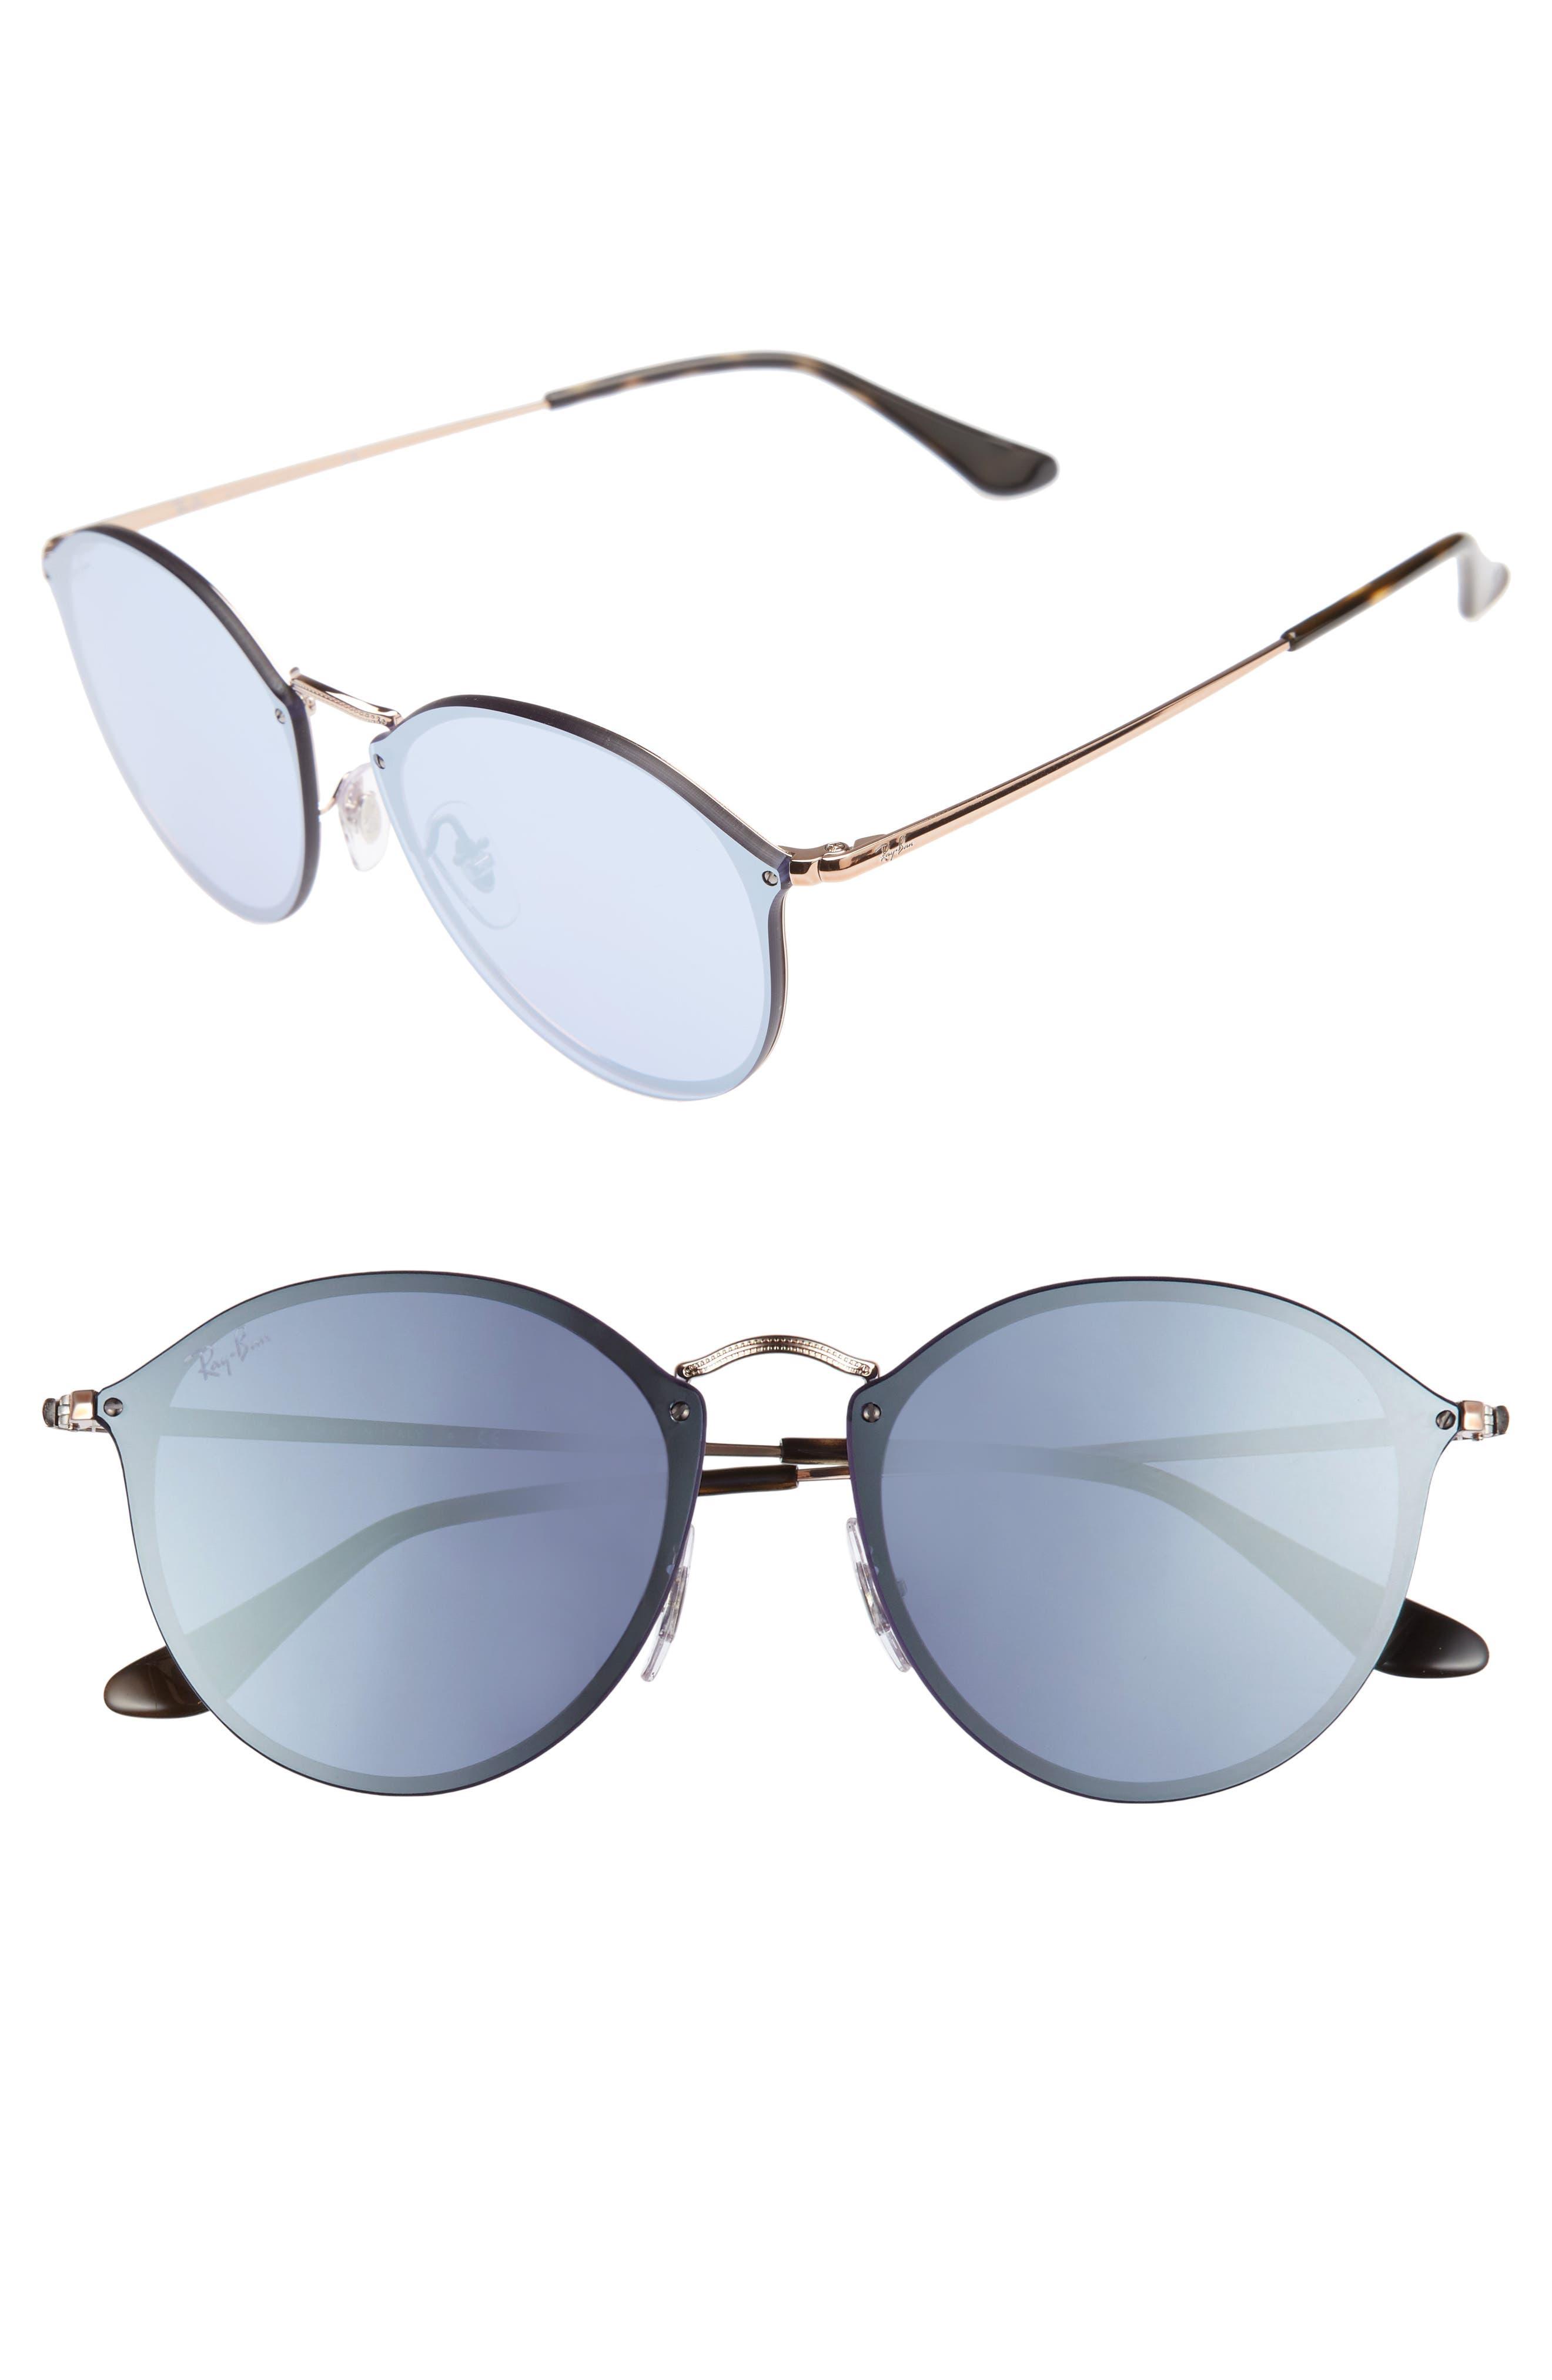 59mm Blaze Round Mirrored Sunglasses,                             Main thumbnail 2, color,